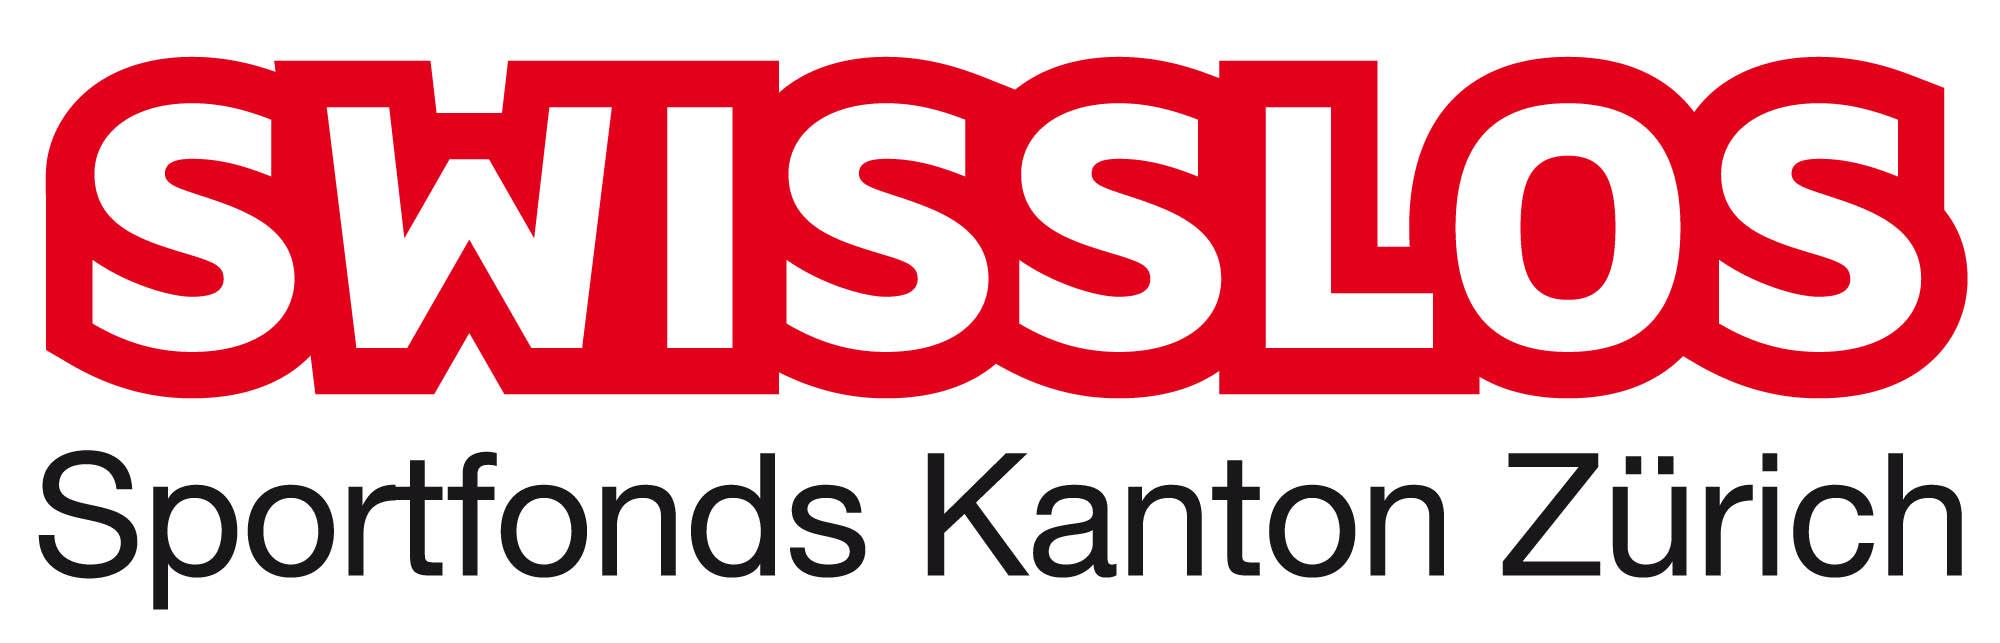 Sportfonds-/Swisslos